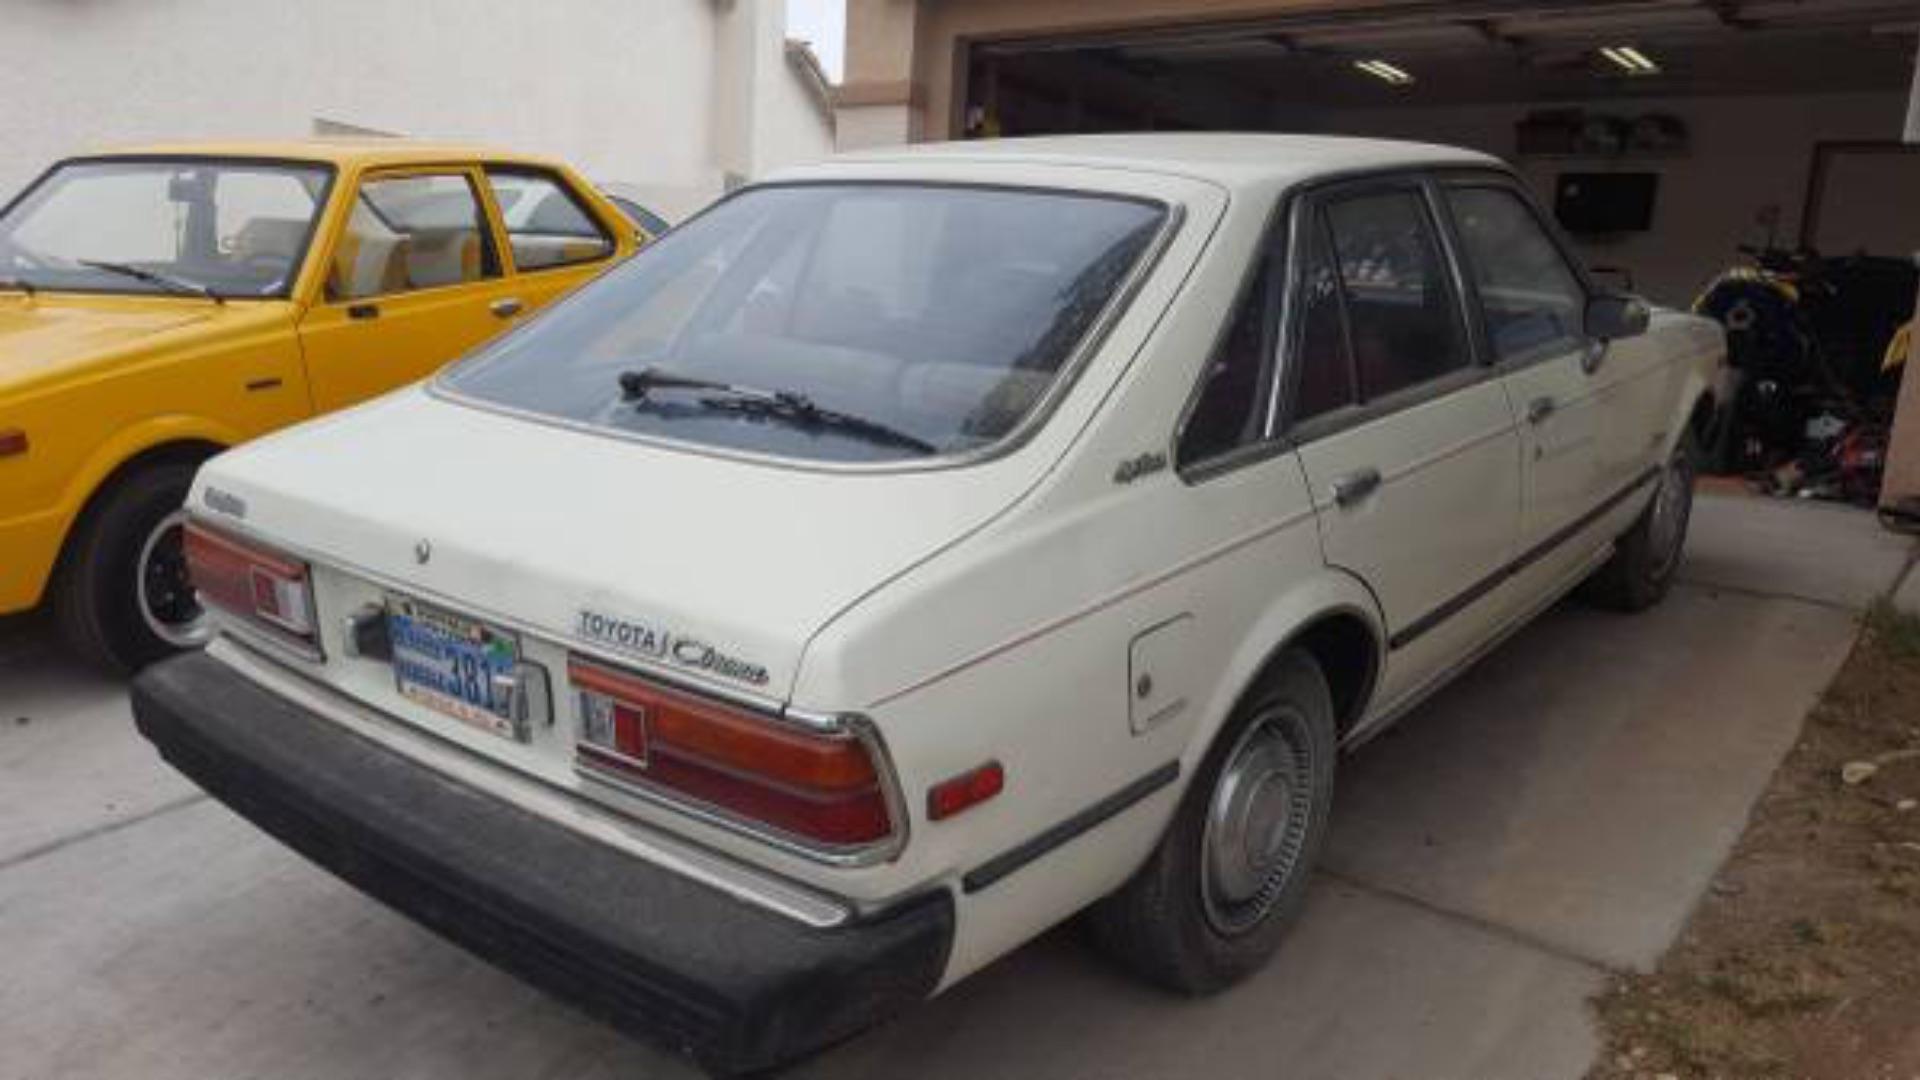 Five Rare Jdm Classic Toyotas Surface On Craigslist Autoclassics Com